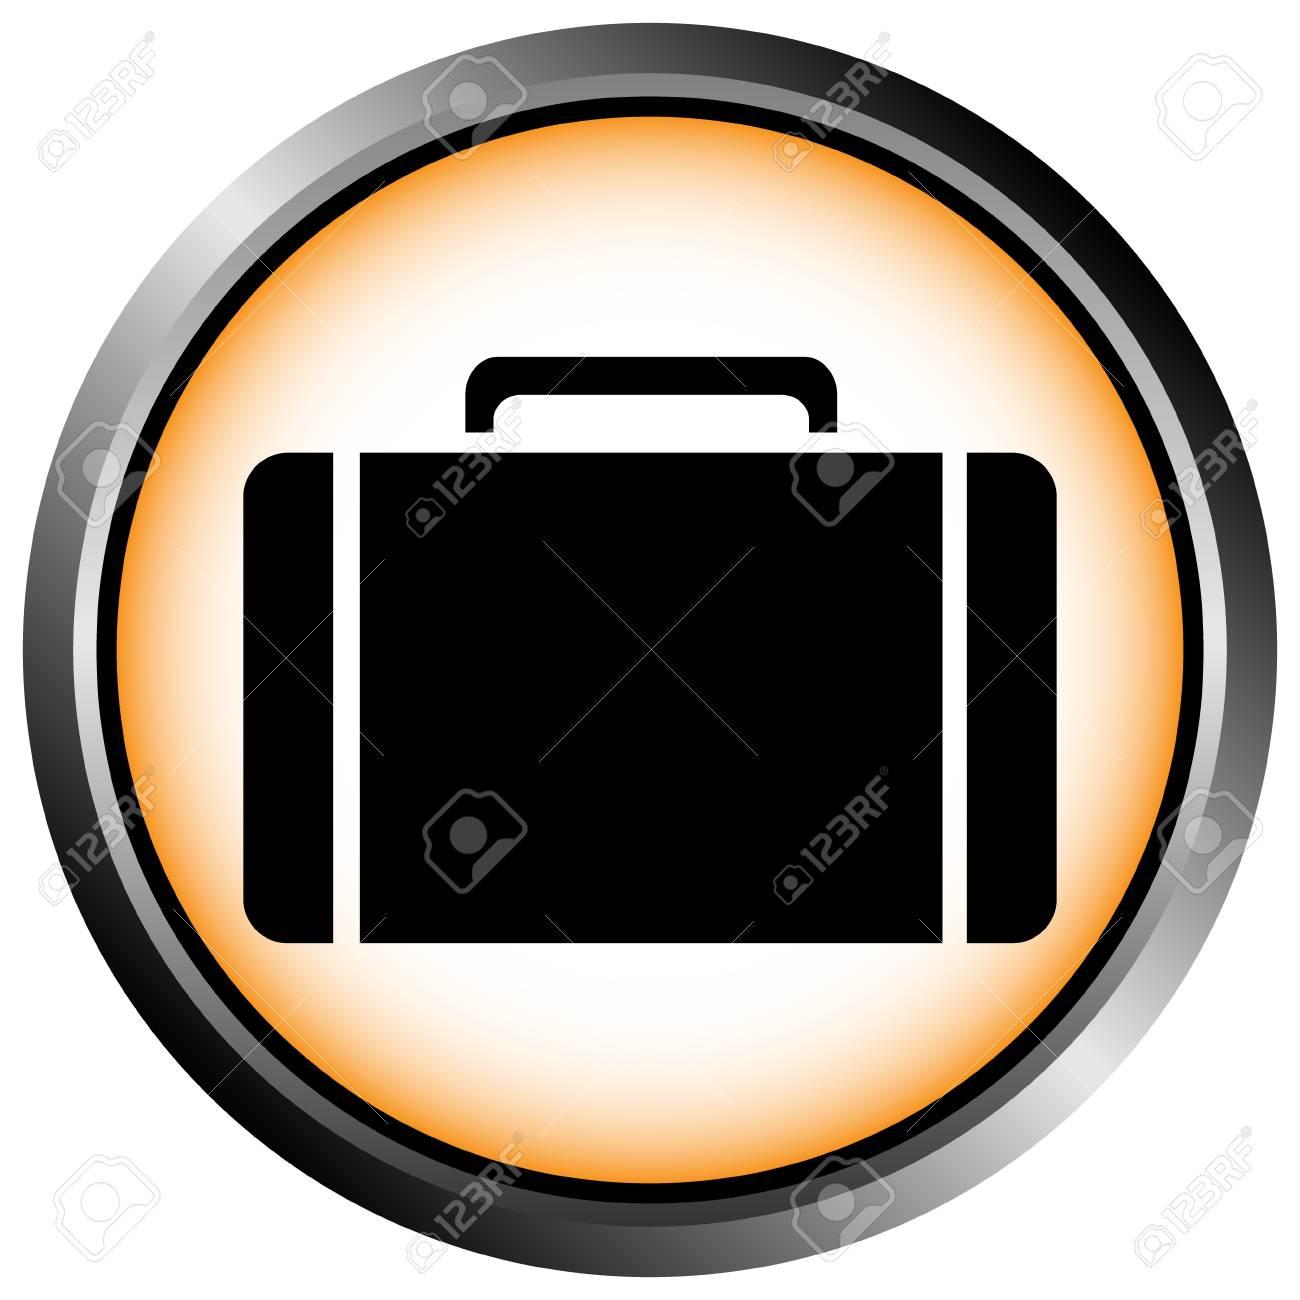 Button with a portfolio on white background Stock Vector - 11471539